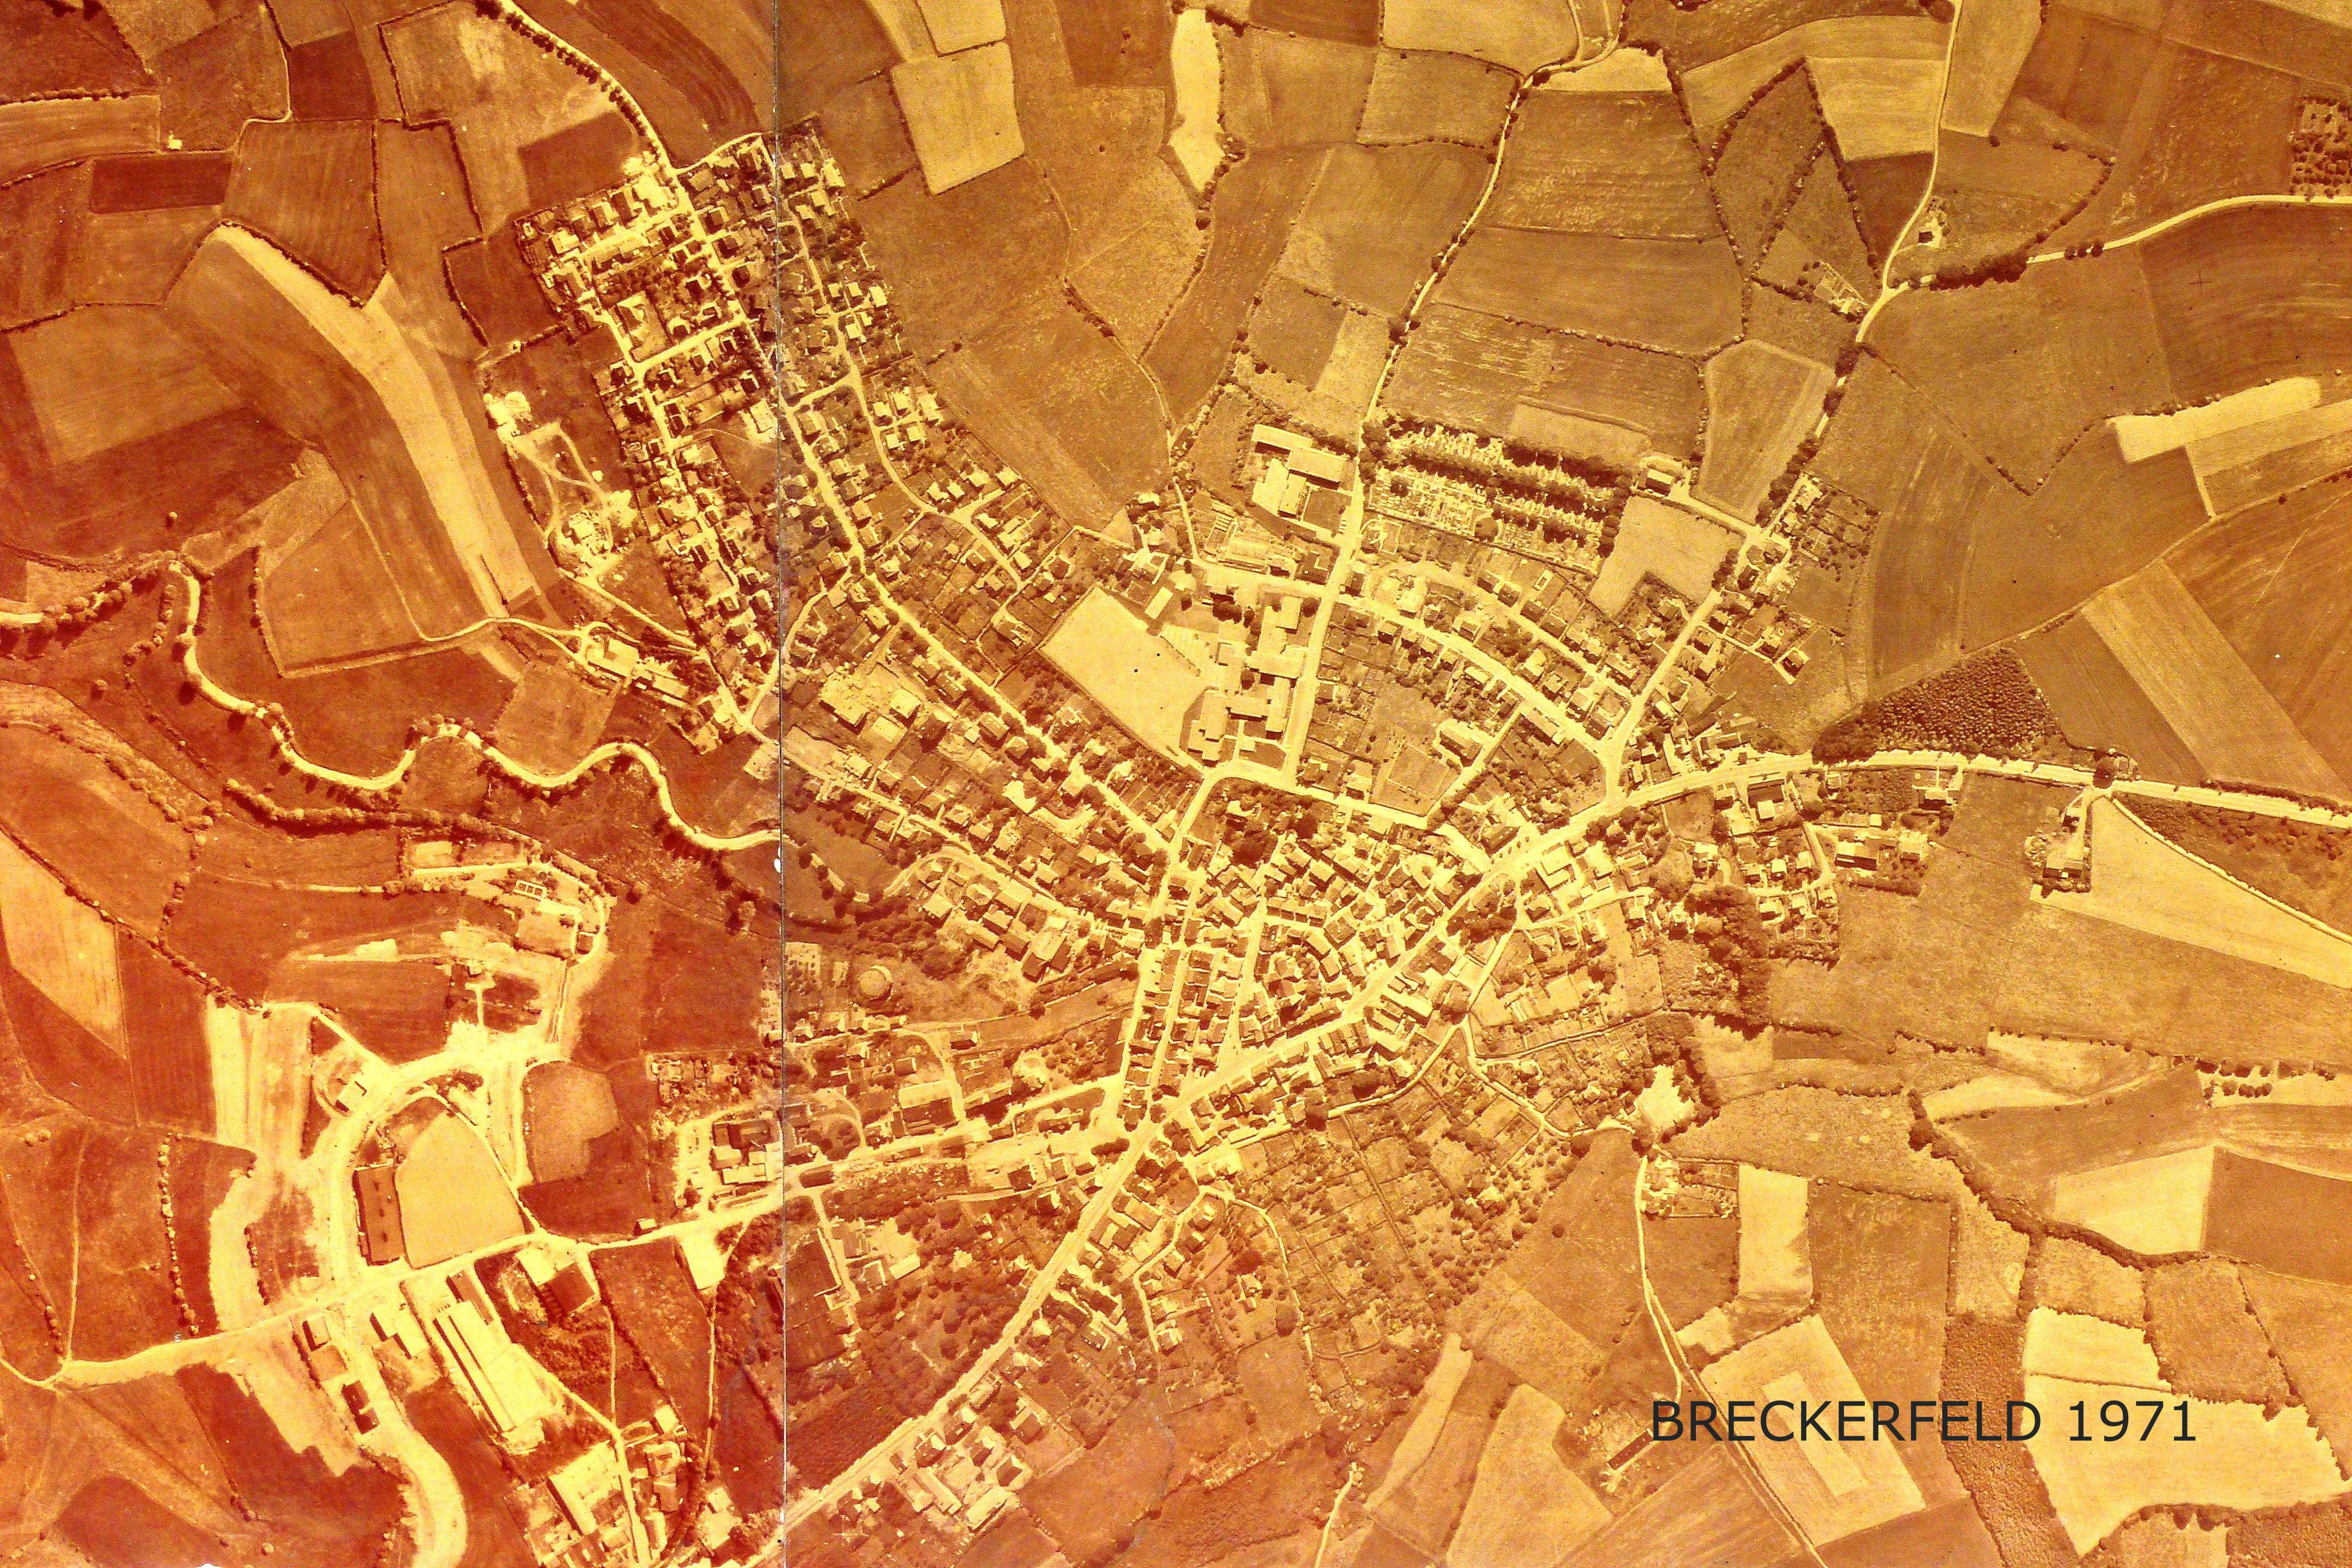 Breckerfeld 007.2